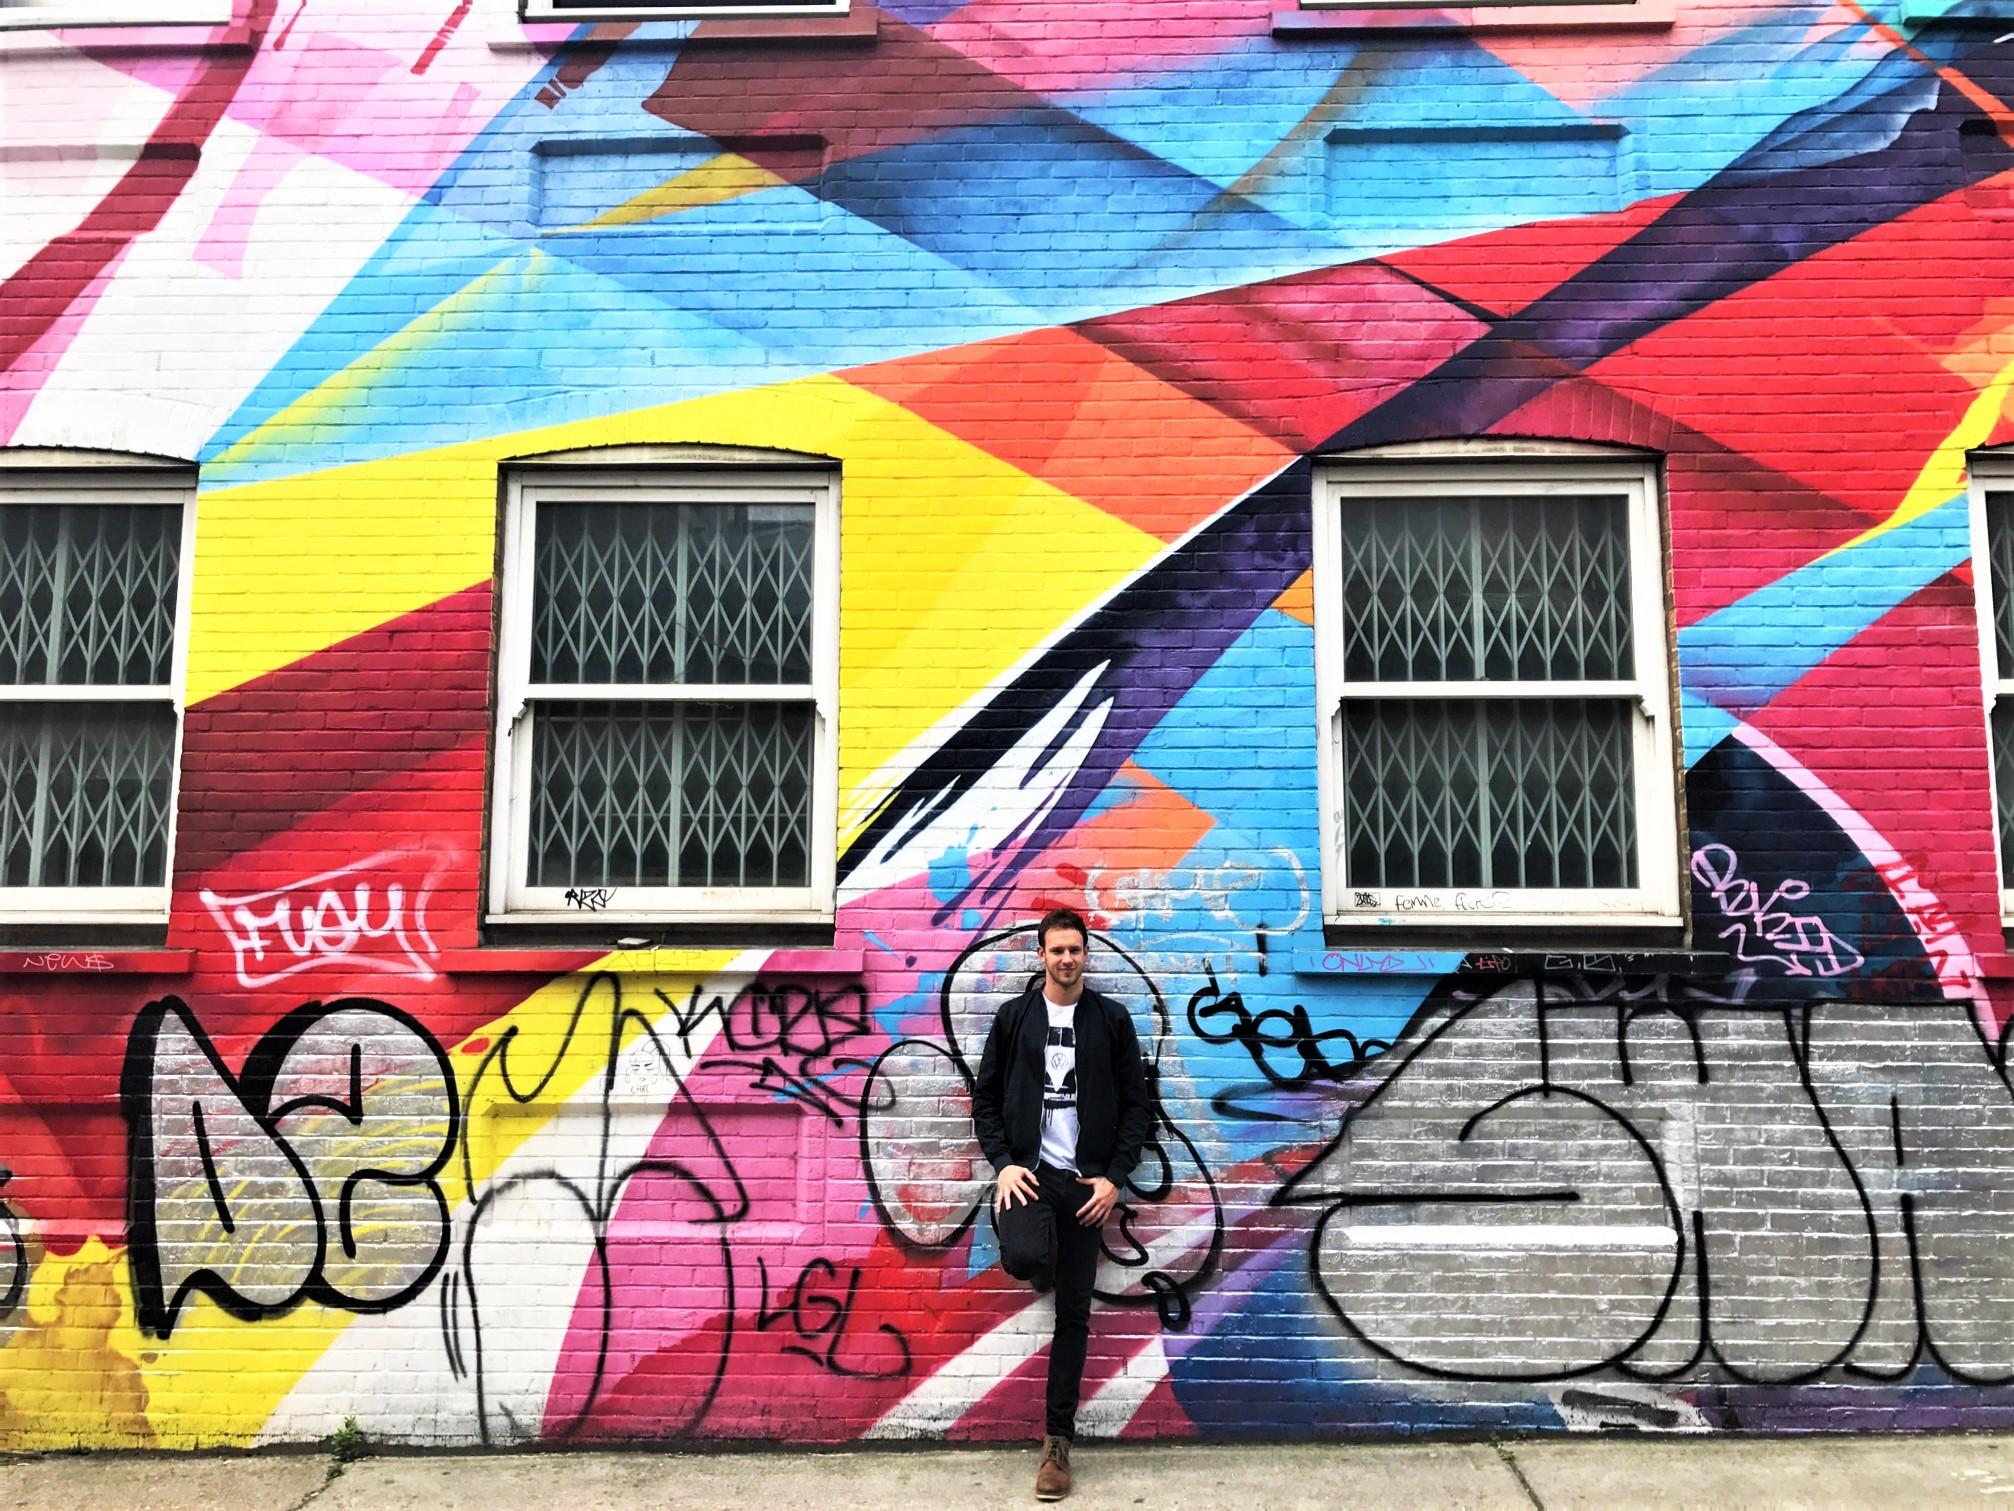 Colorful wall graffiti in east London